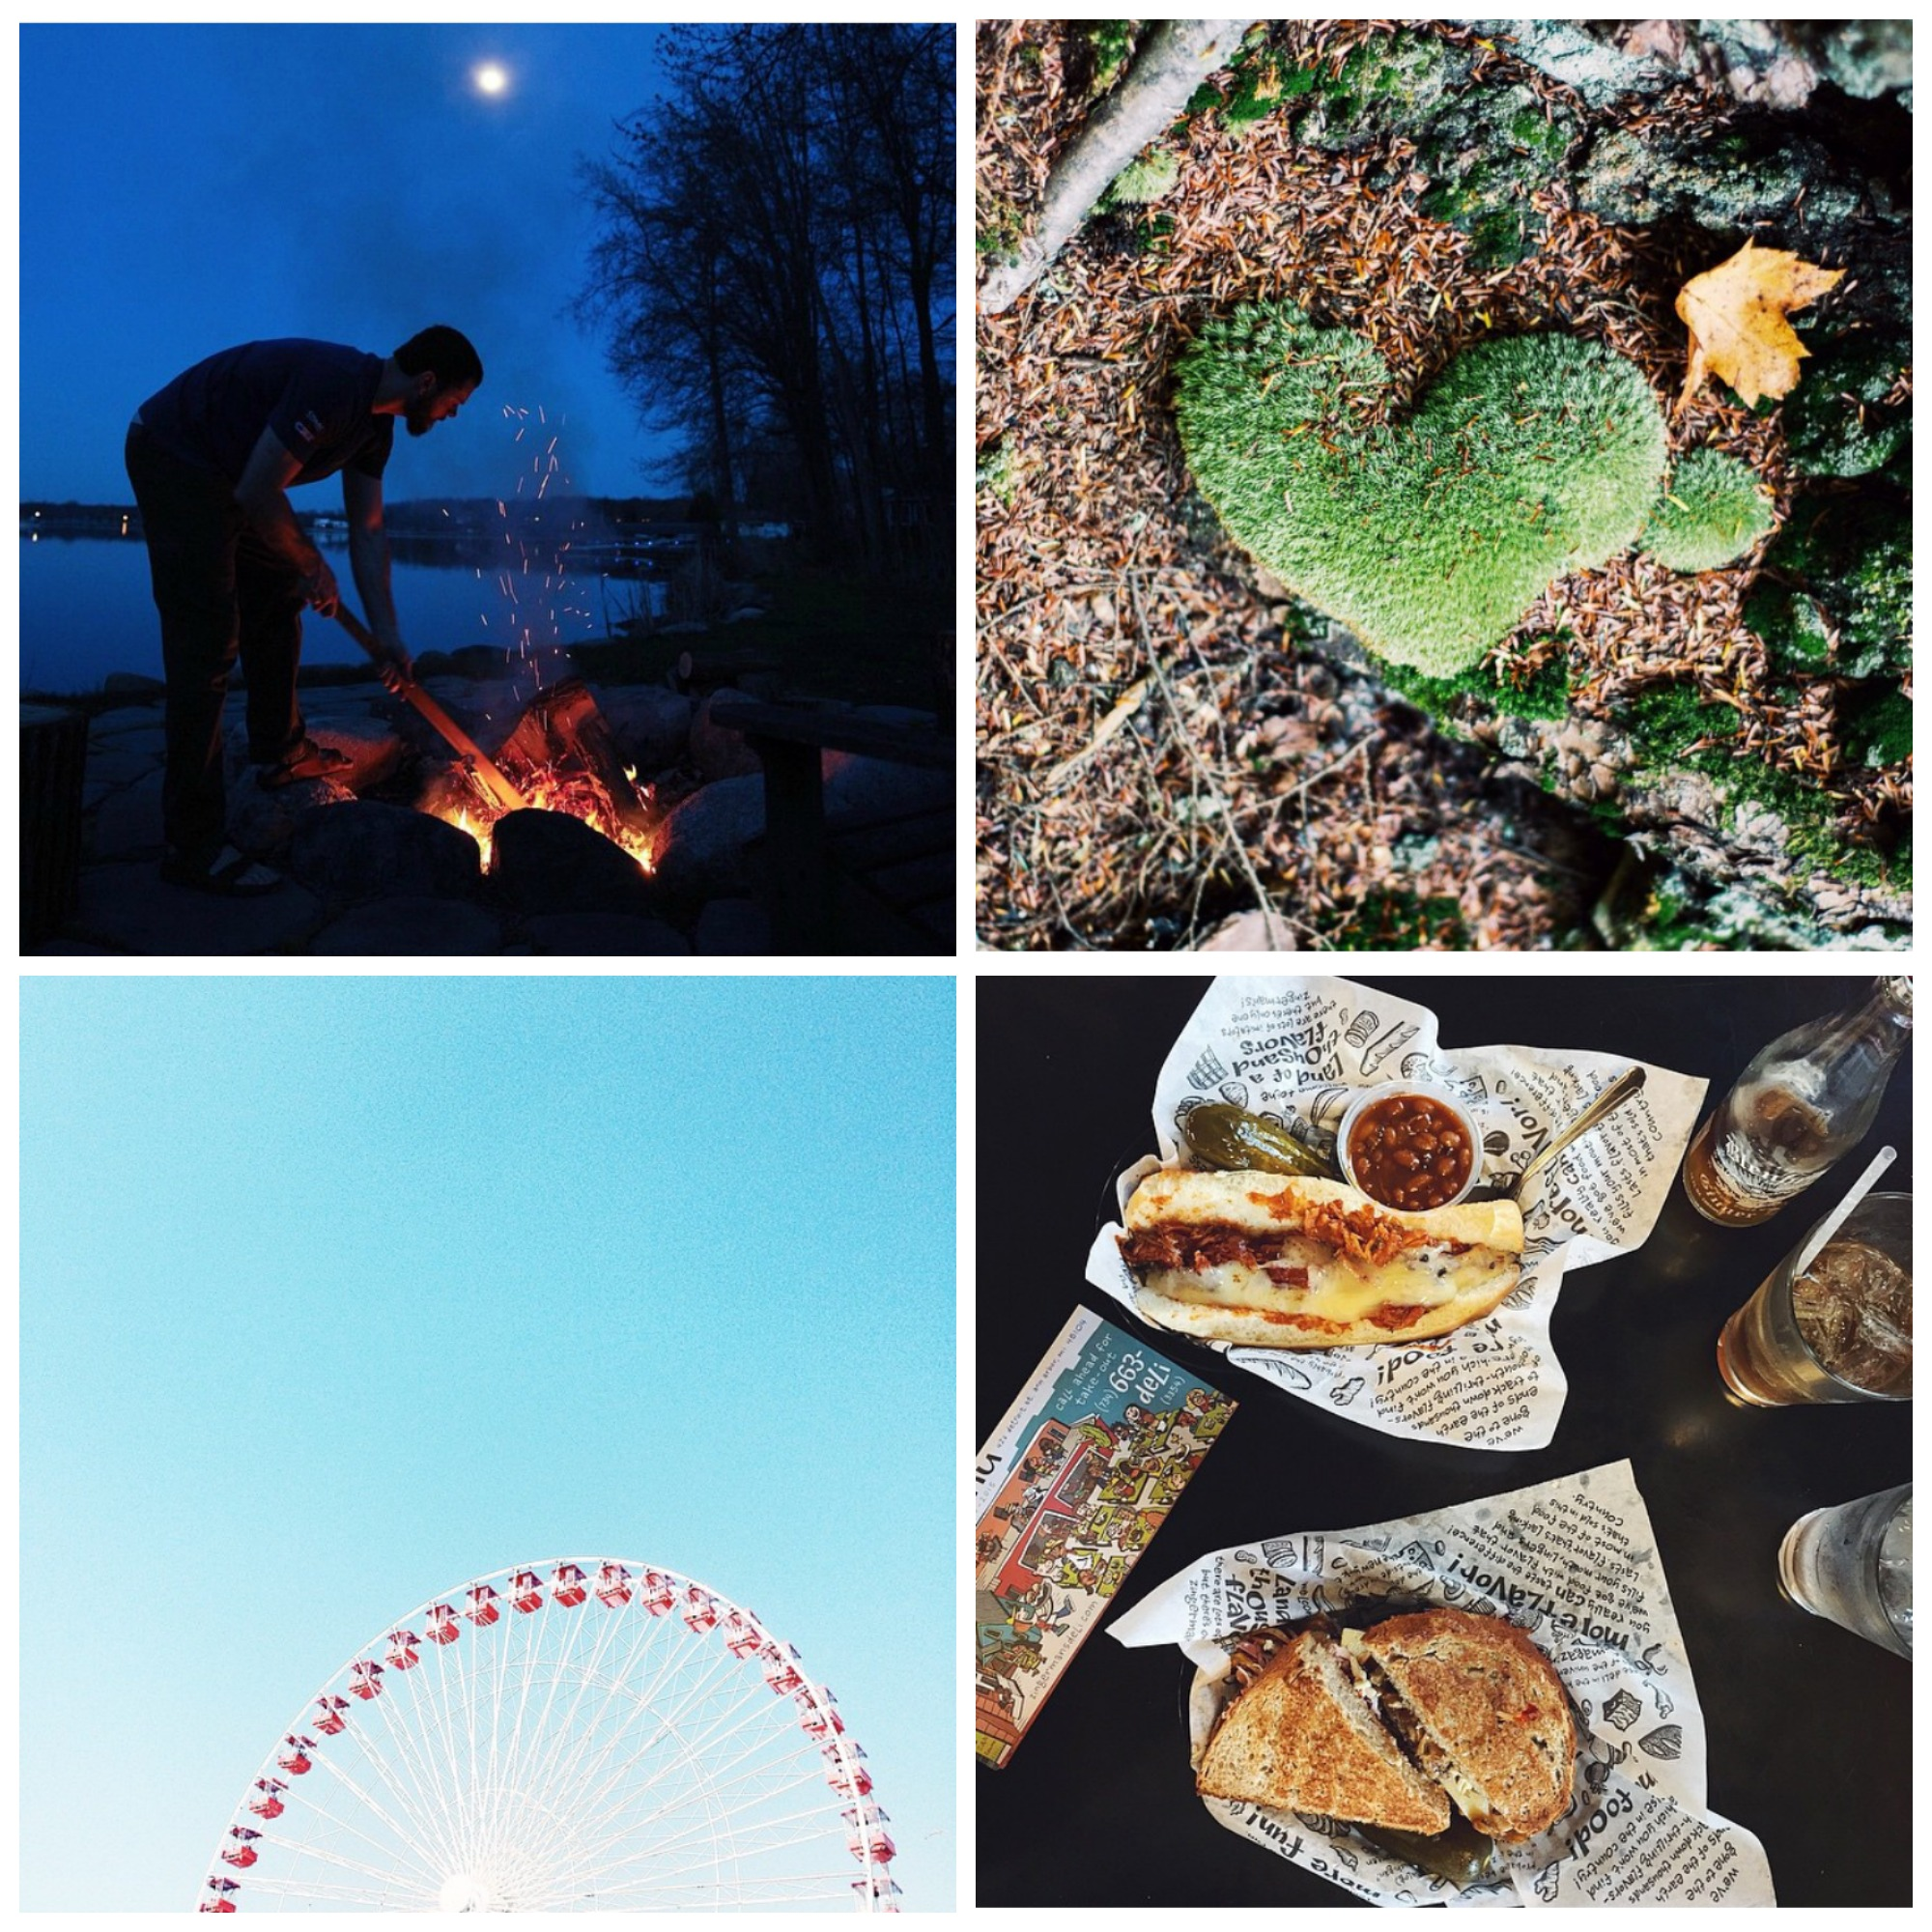 This week's Instacrushes!Clockwise from top left: @ catbwell , @ meniquekoos , @ mightyinthemitten , @ erikadenhoed